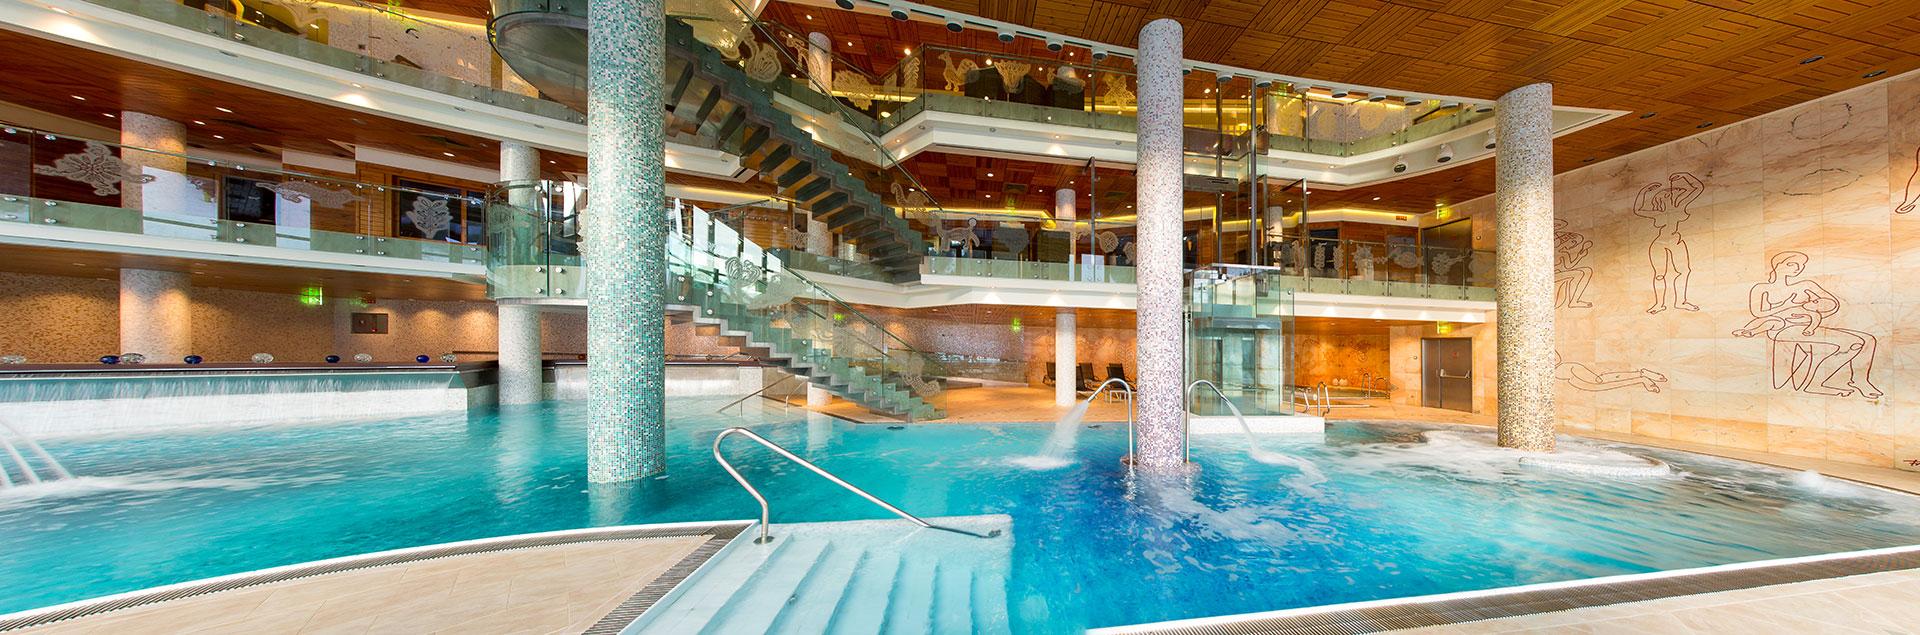 Hotel Sport Andorra Spa